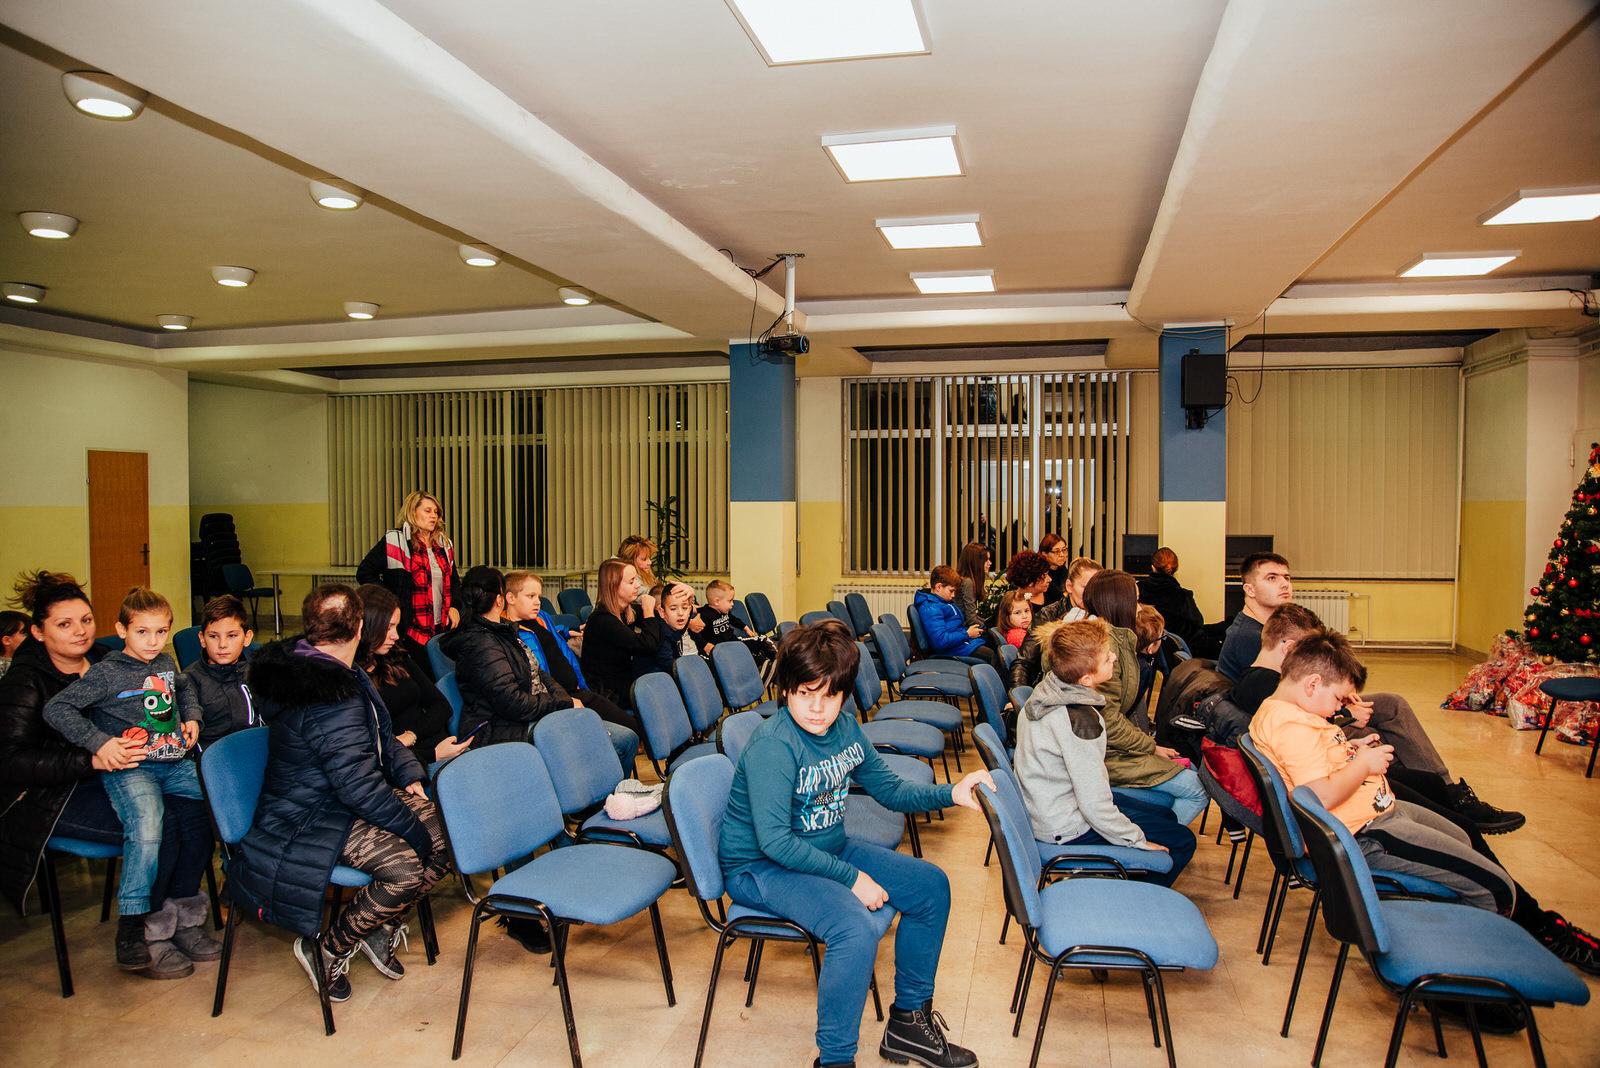 likaclub_airsoft-team-gospić-i-udruga-pčelice_2019-2